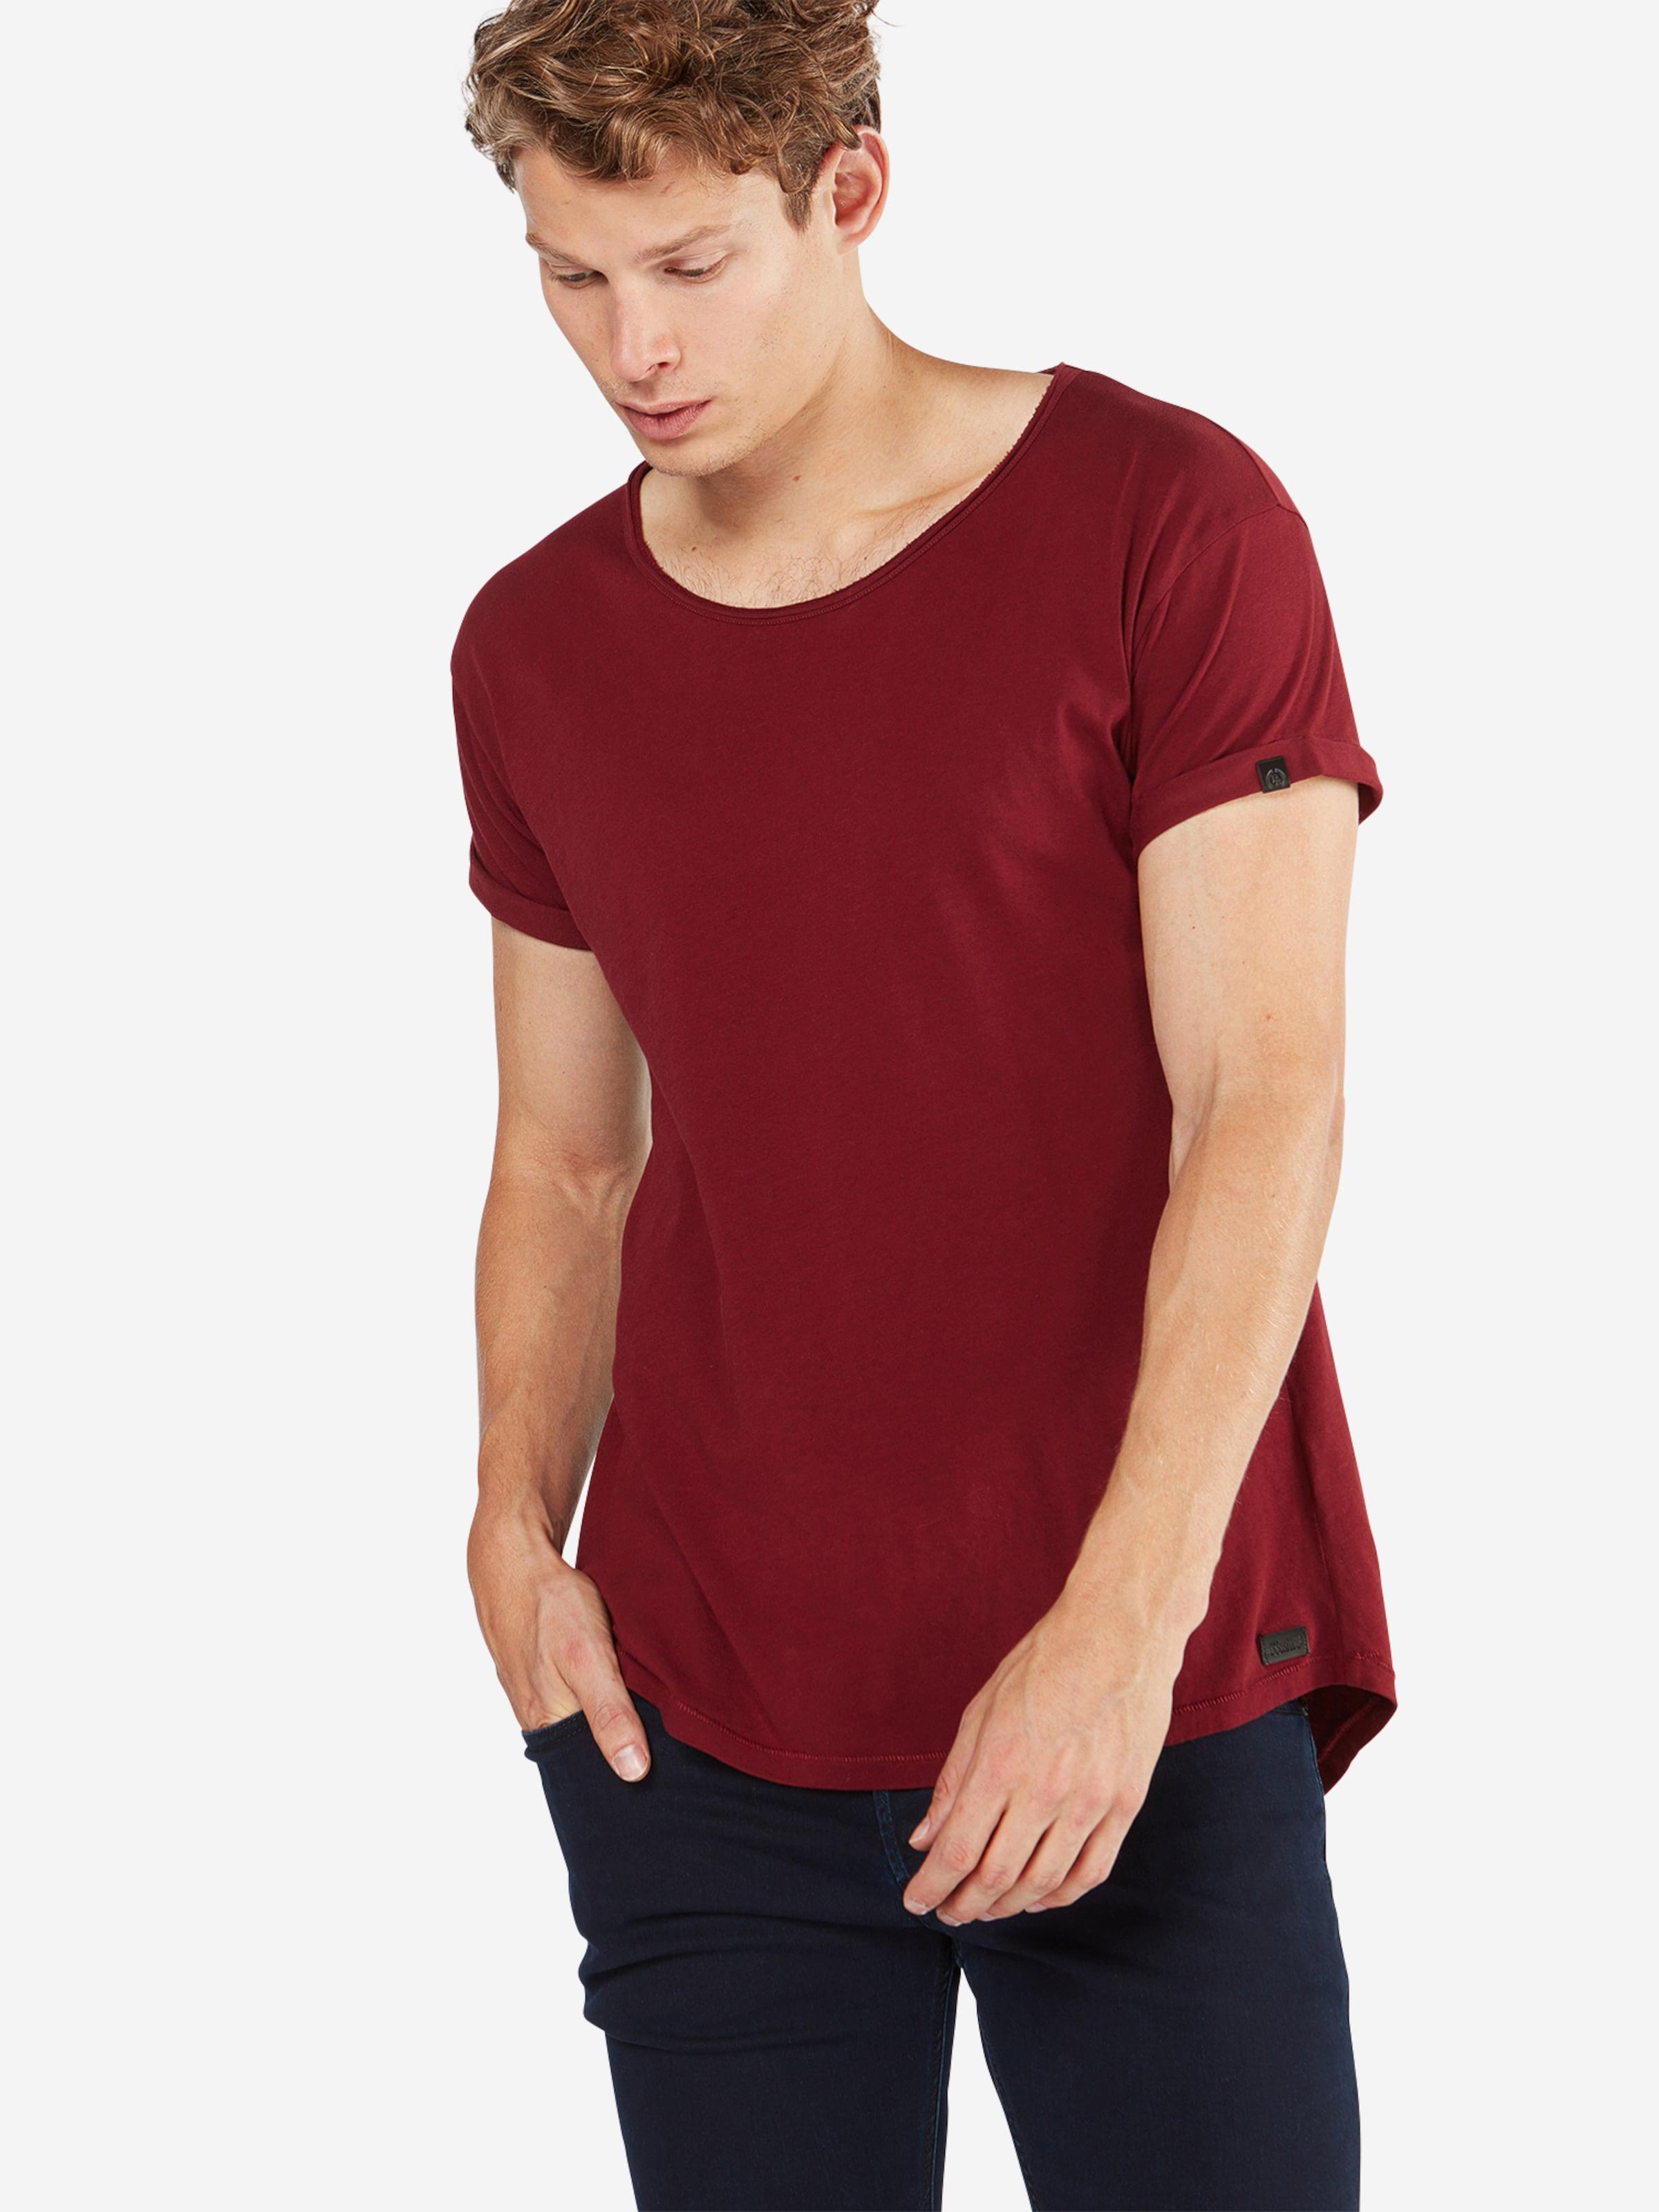 BOOM BAP T-Shirt in Cold-Dyed-Optik Sehr Günstig y4PAK6bVM